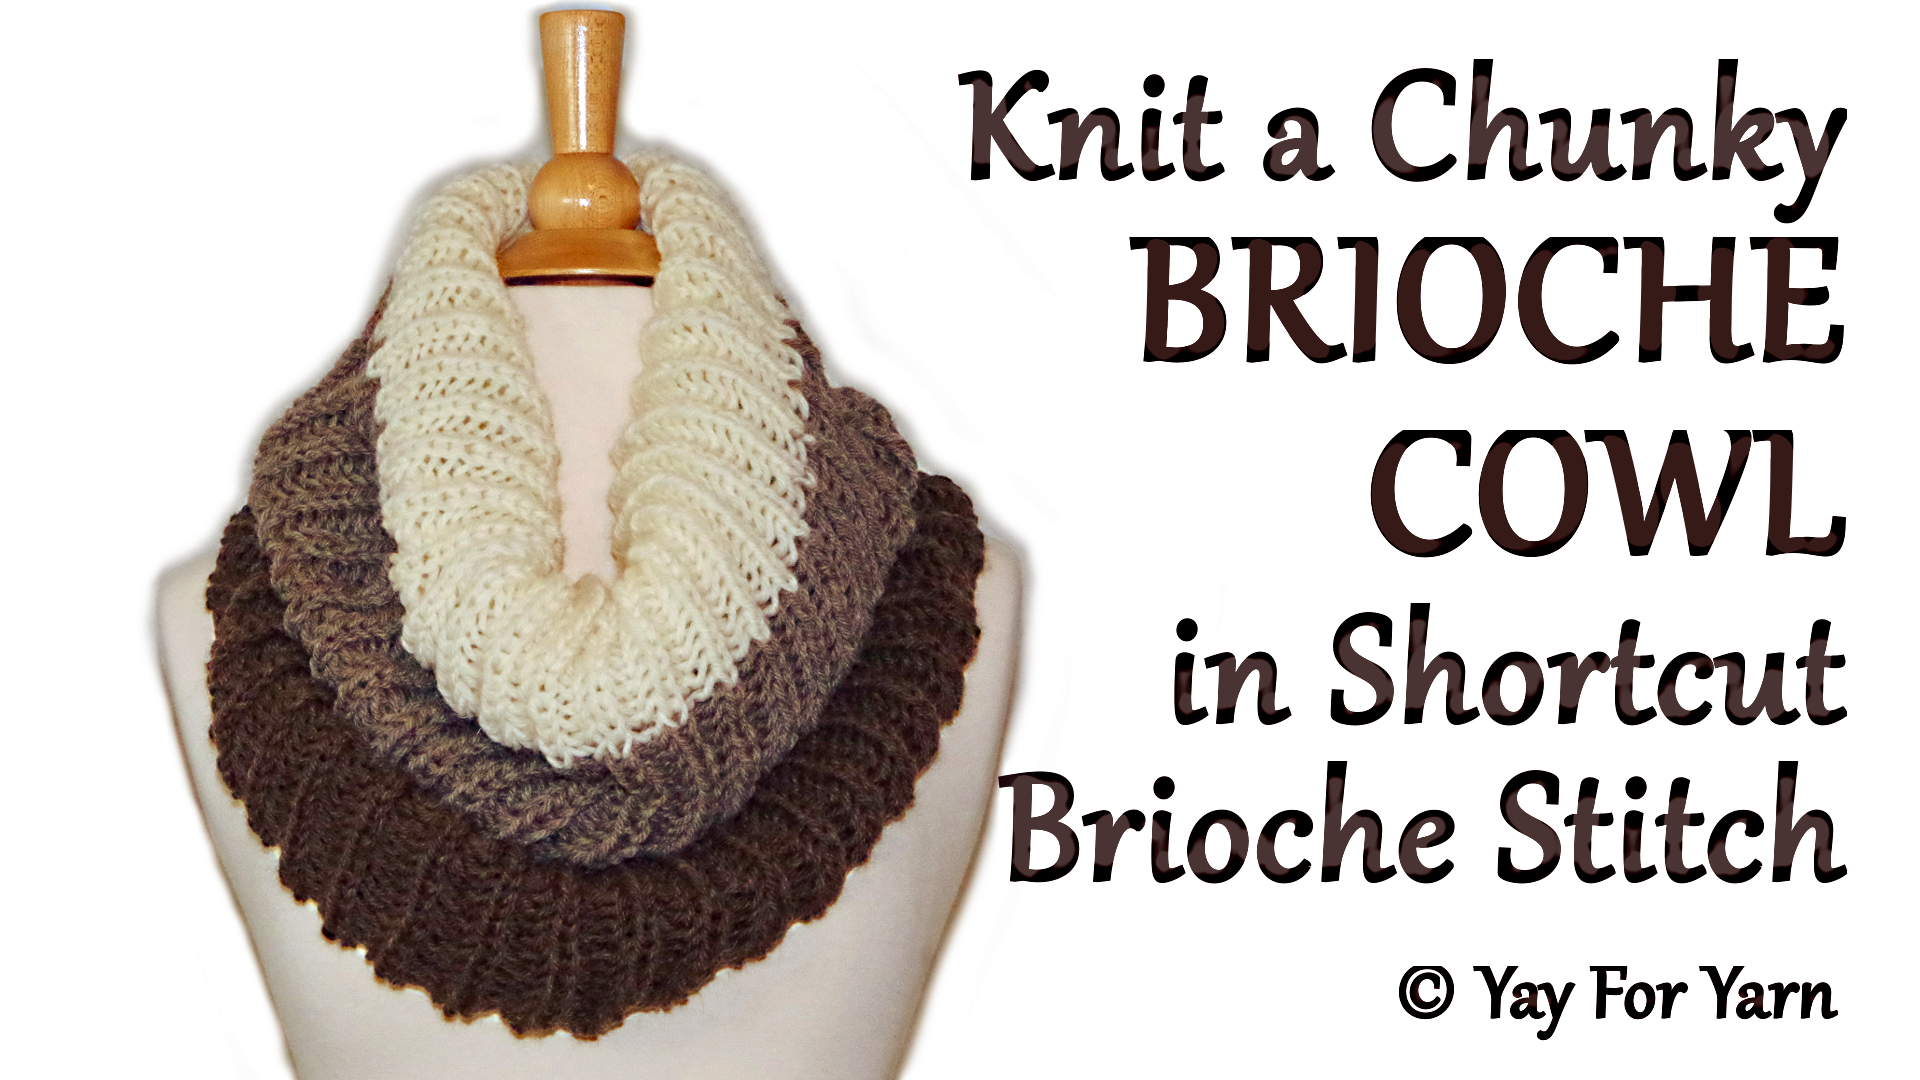 How to Knit an Easy Brioche Cowl in SHORTCUT Brioche Stitch – Free ...